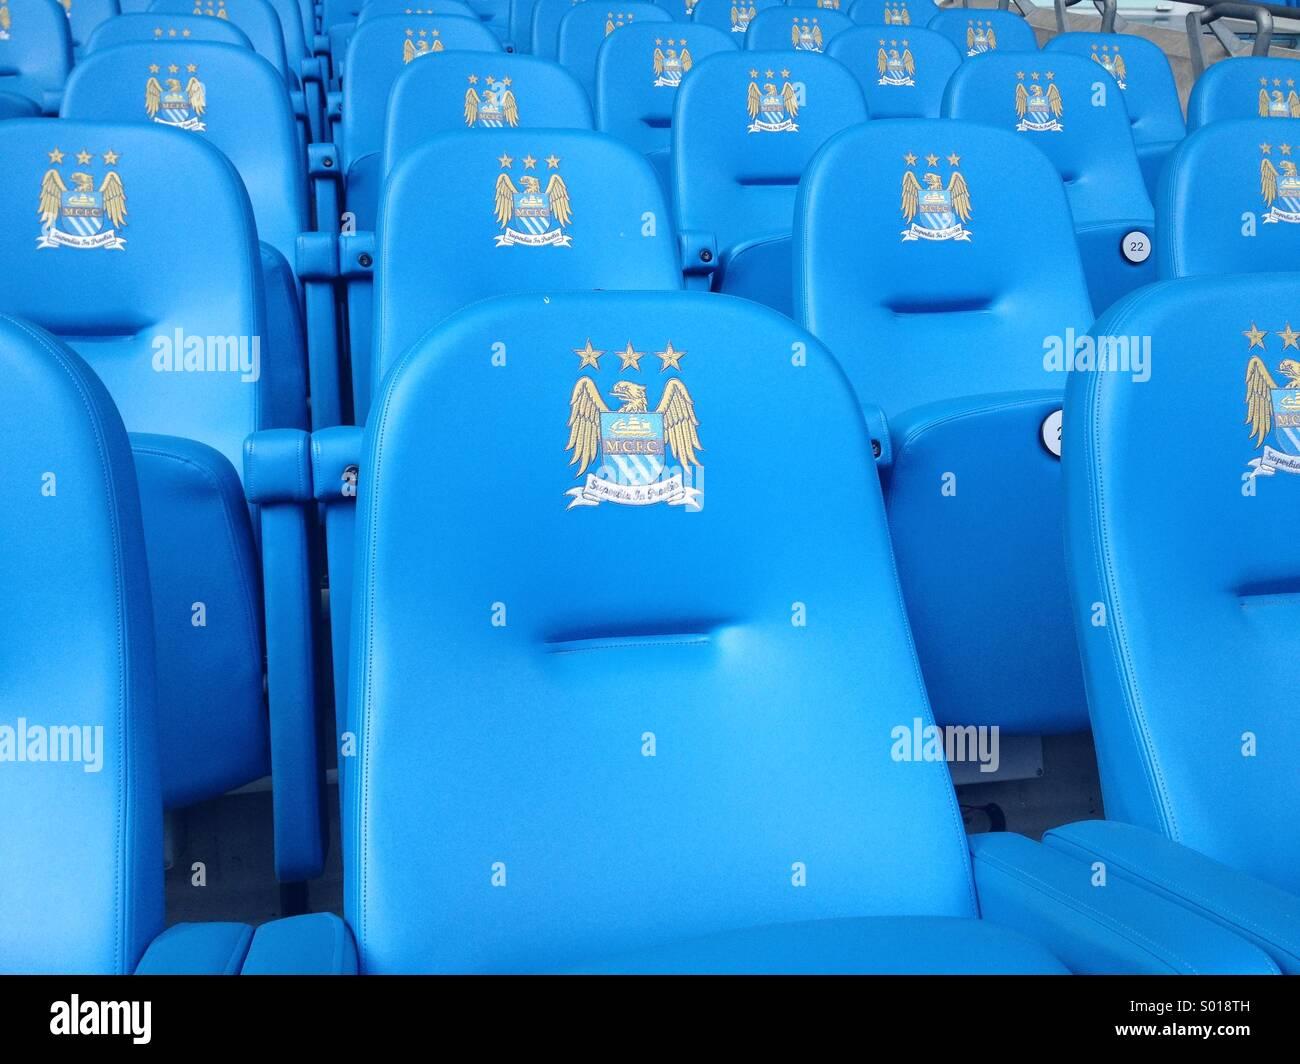 Etihad stadium seats - Stock Image